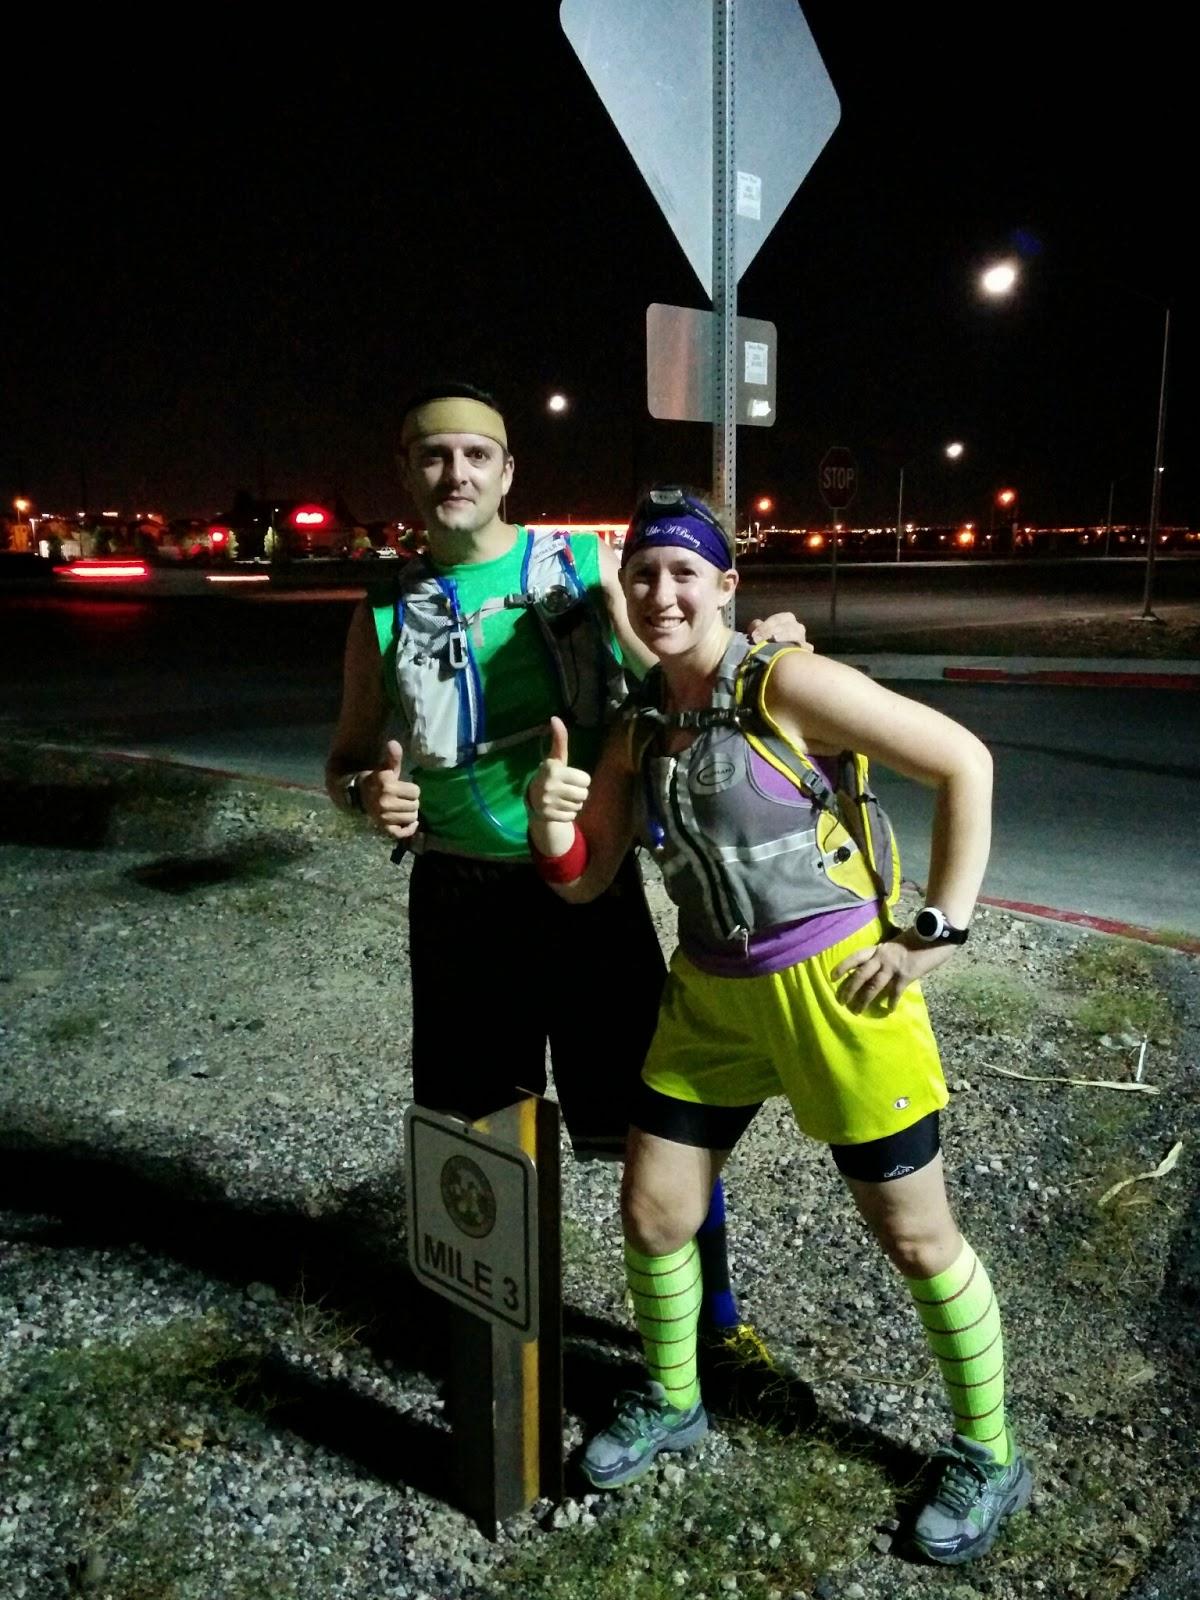 #HalfTrainingWithJeff 3 weeks to ET (half) Marathon